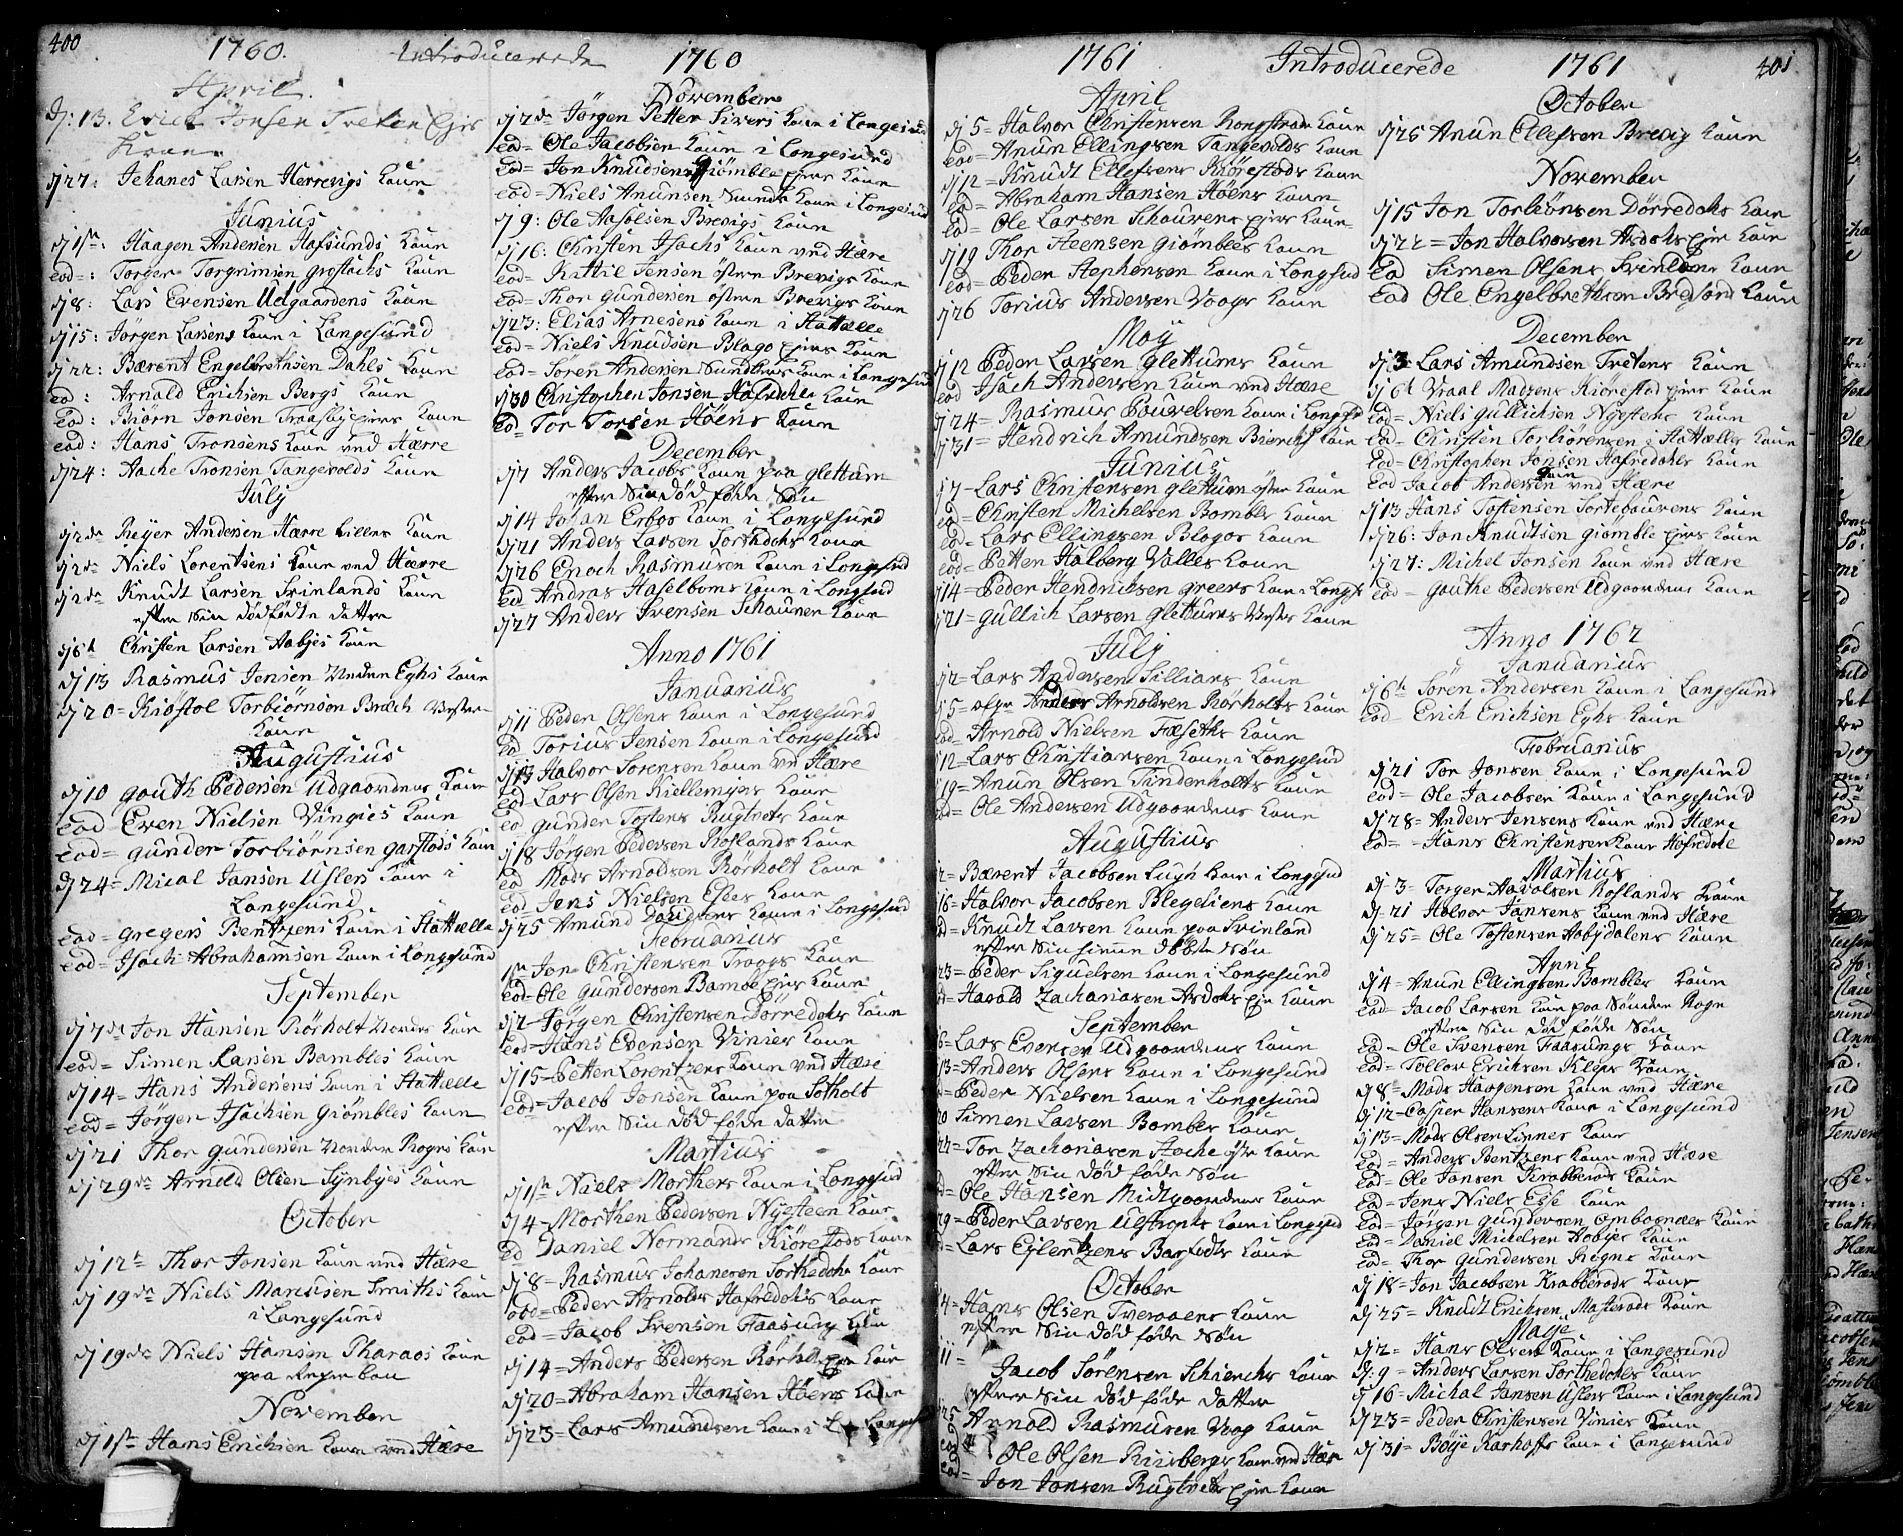 SAKO, Bamble kirkebøker, F/Fa/L0001: Ministerialbok nr. I 1, 1702-1774, s. 400-401